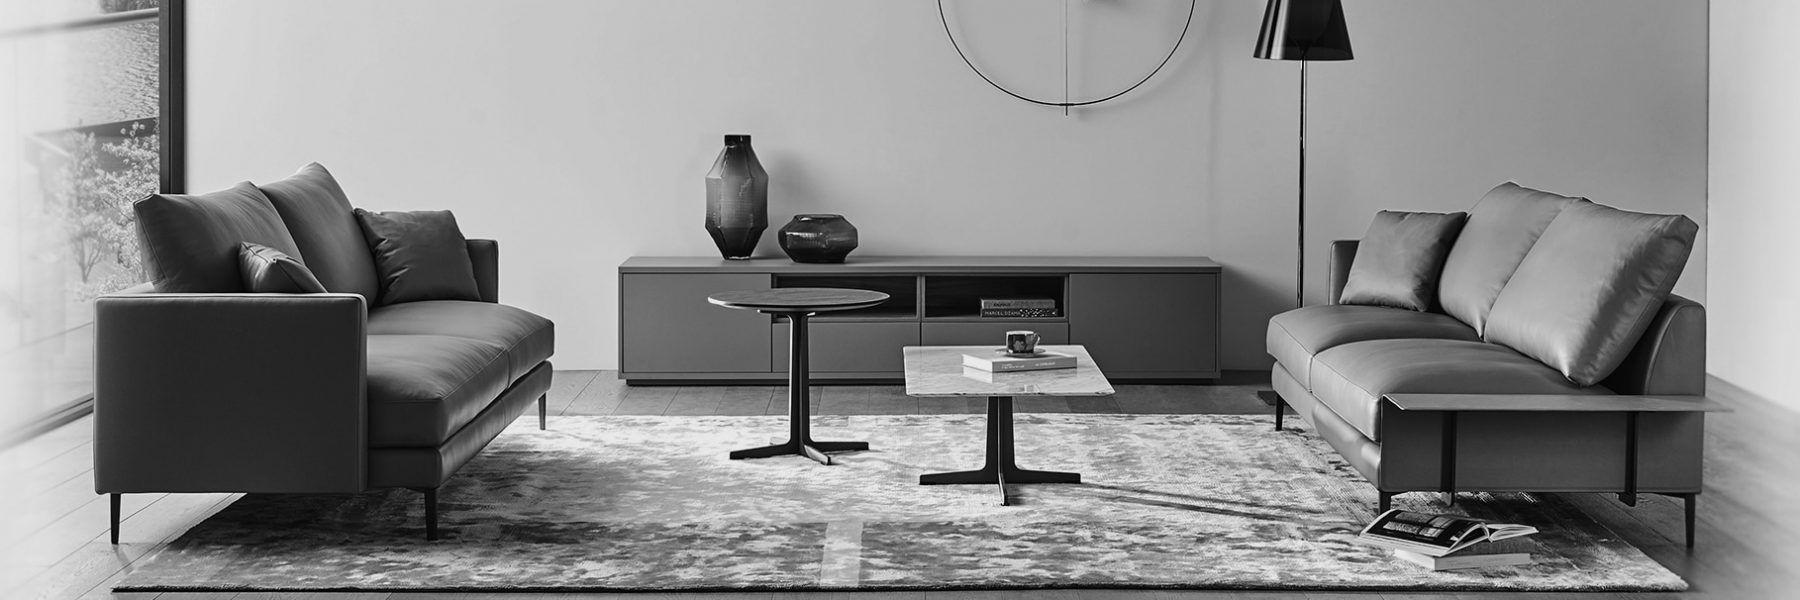 RM Living Cincinnati Contemporary Interior Design Custom Modern Furniture By Camerich